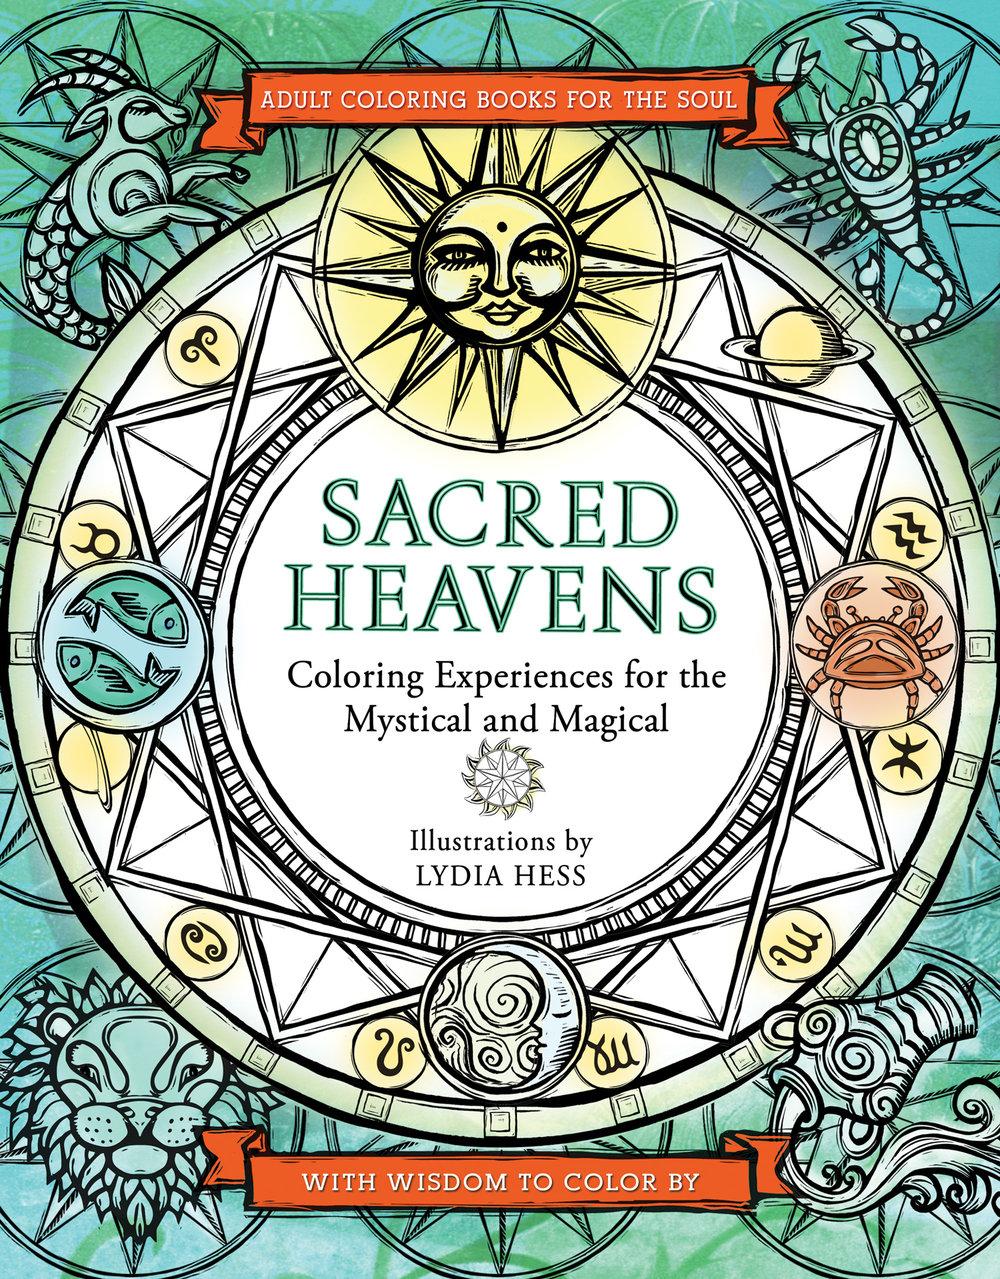 Sacred Animals Coloring Book 999 SacredHeavens Cover V3